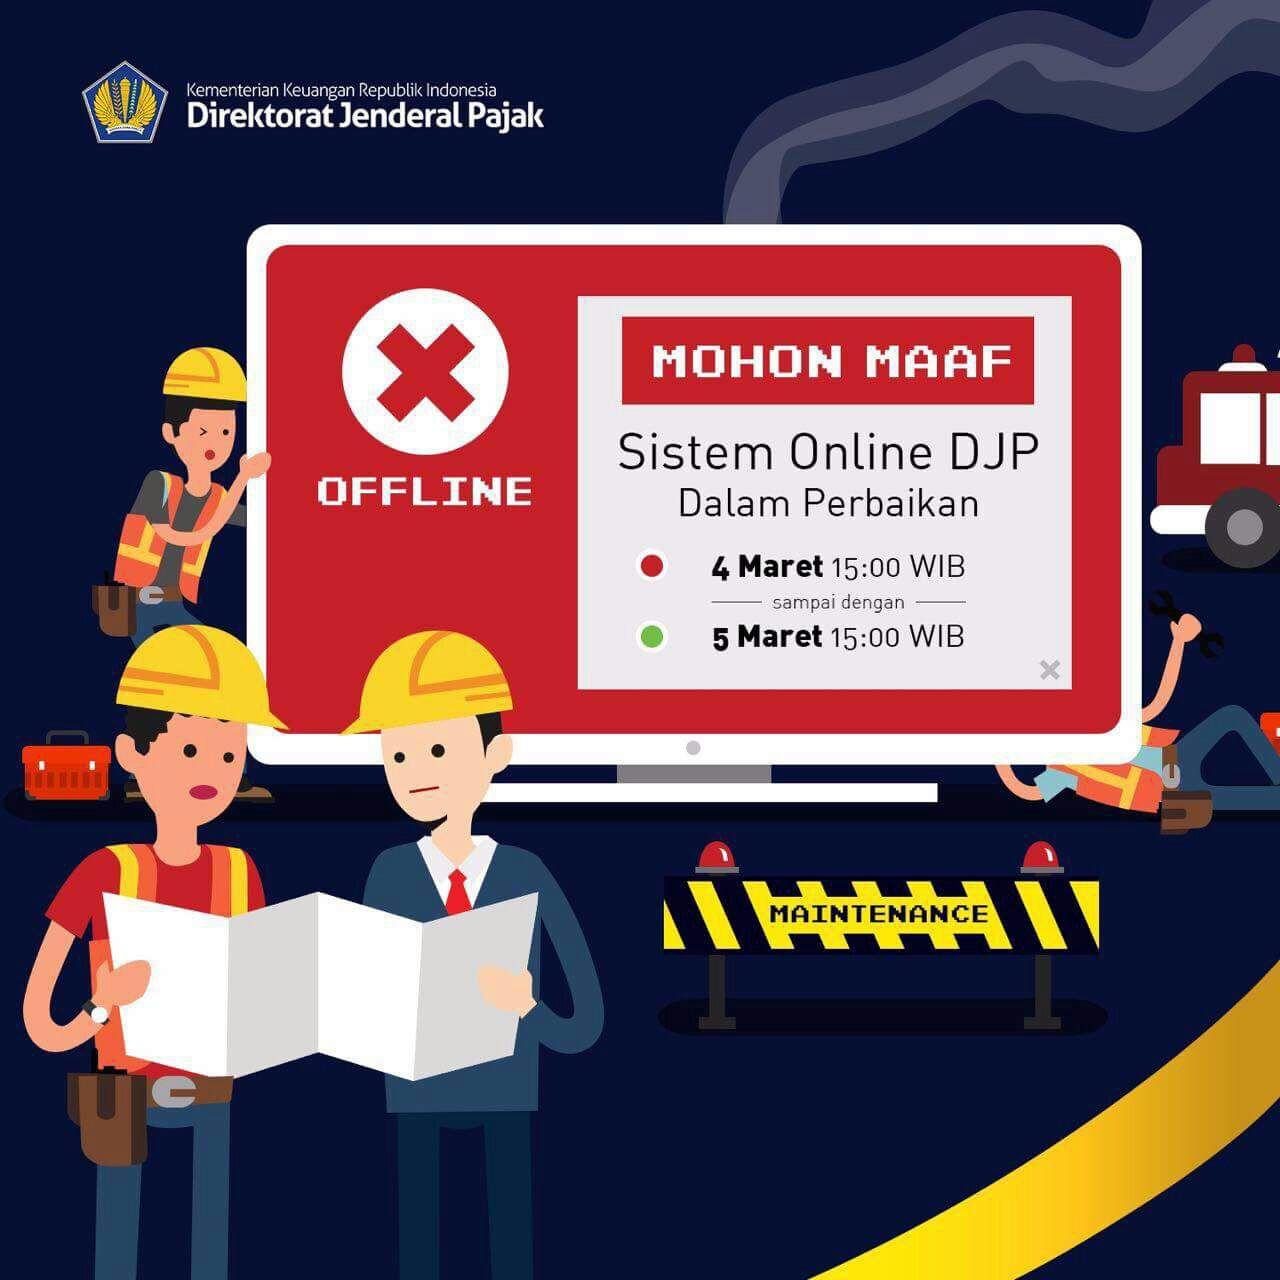 DJP Online Under Maintenance